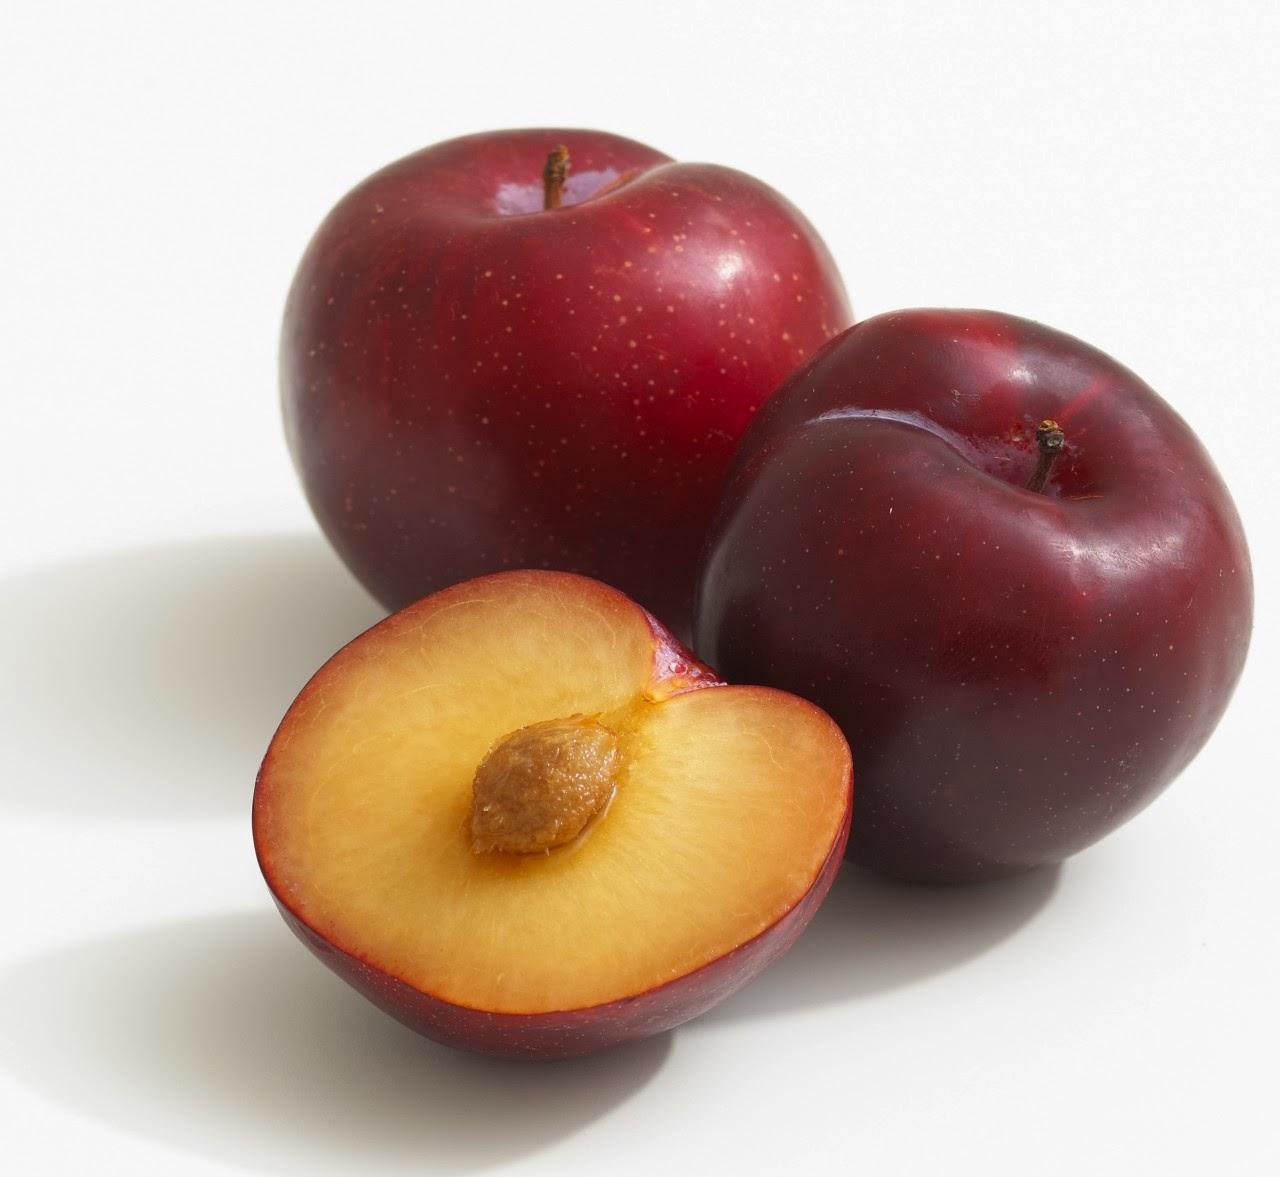 ezee beauty beauty with juicy plums